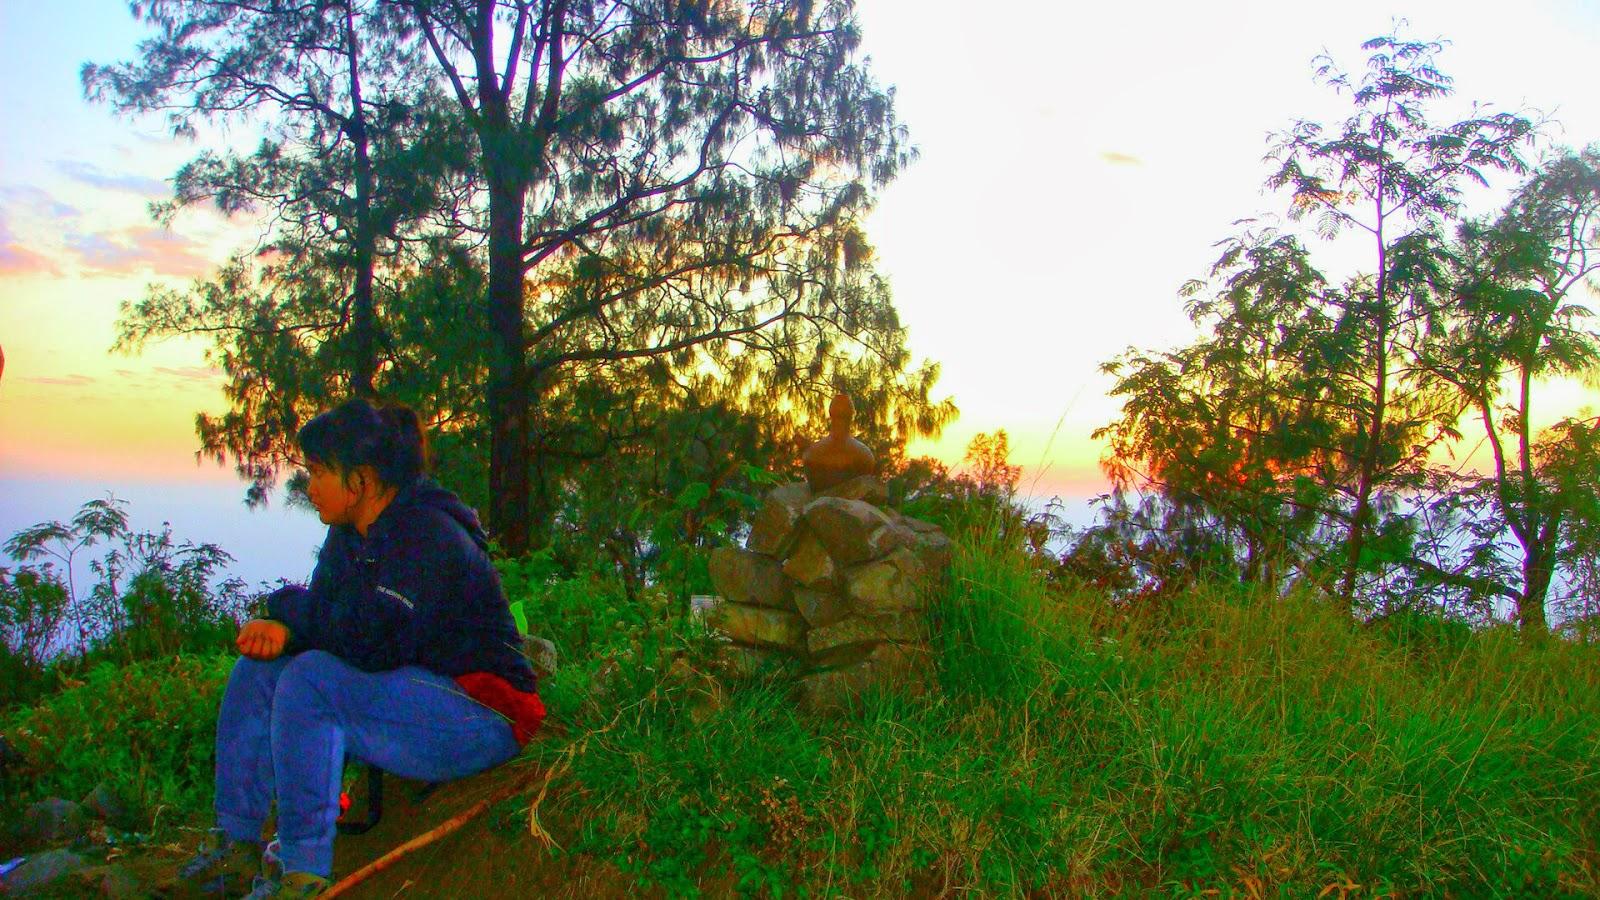 Rosela Gunung Wilis Penampihan Sendang Tulungagung 2 Mas Lintang Wanto